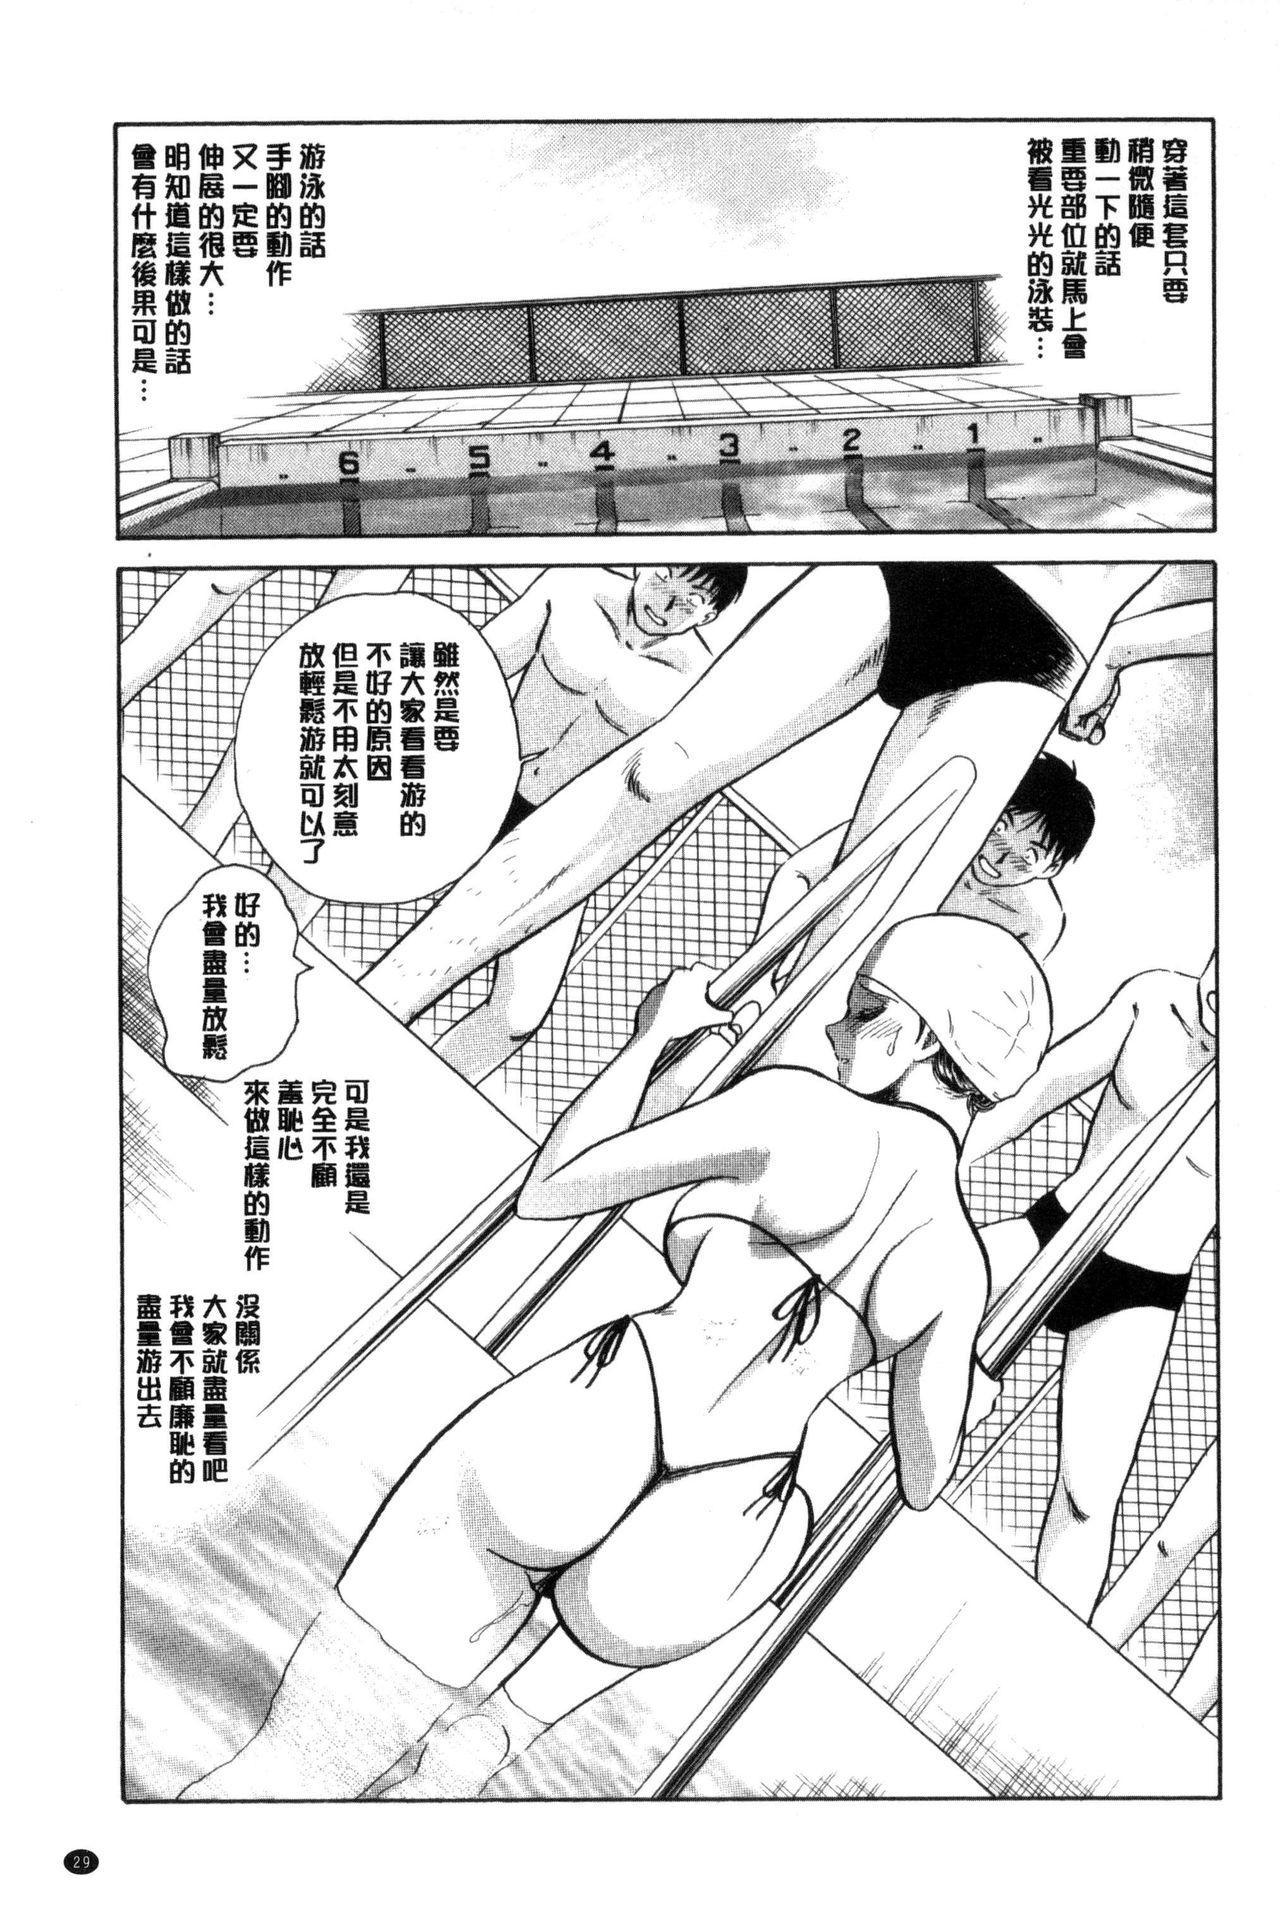 Hazukashii Kagai Jugyou | 害羞的課外授業 29